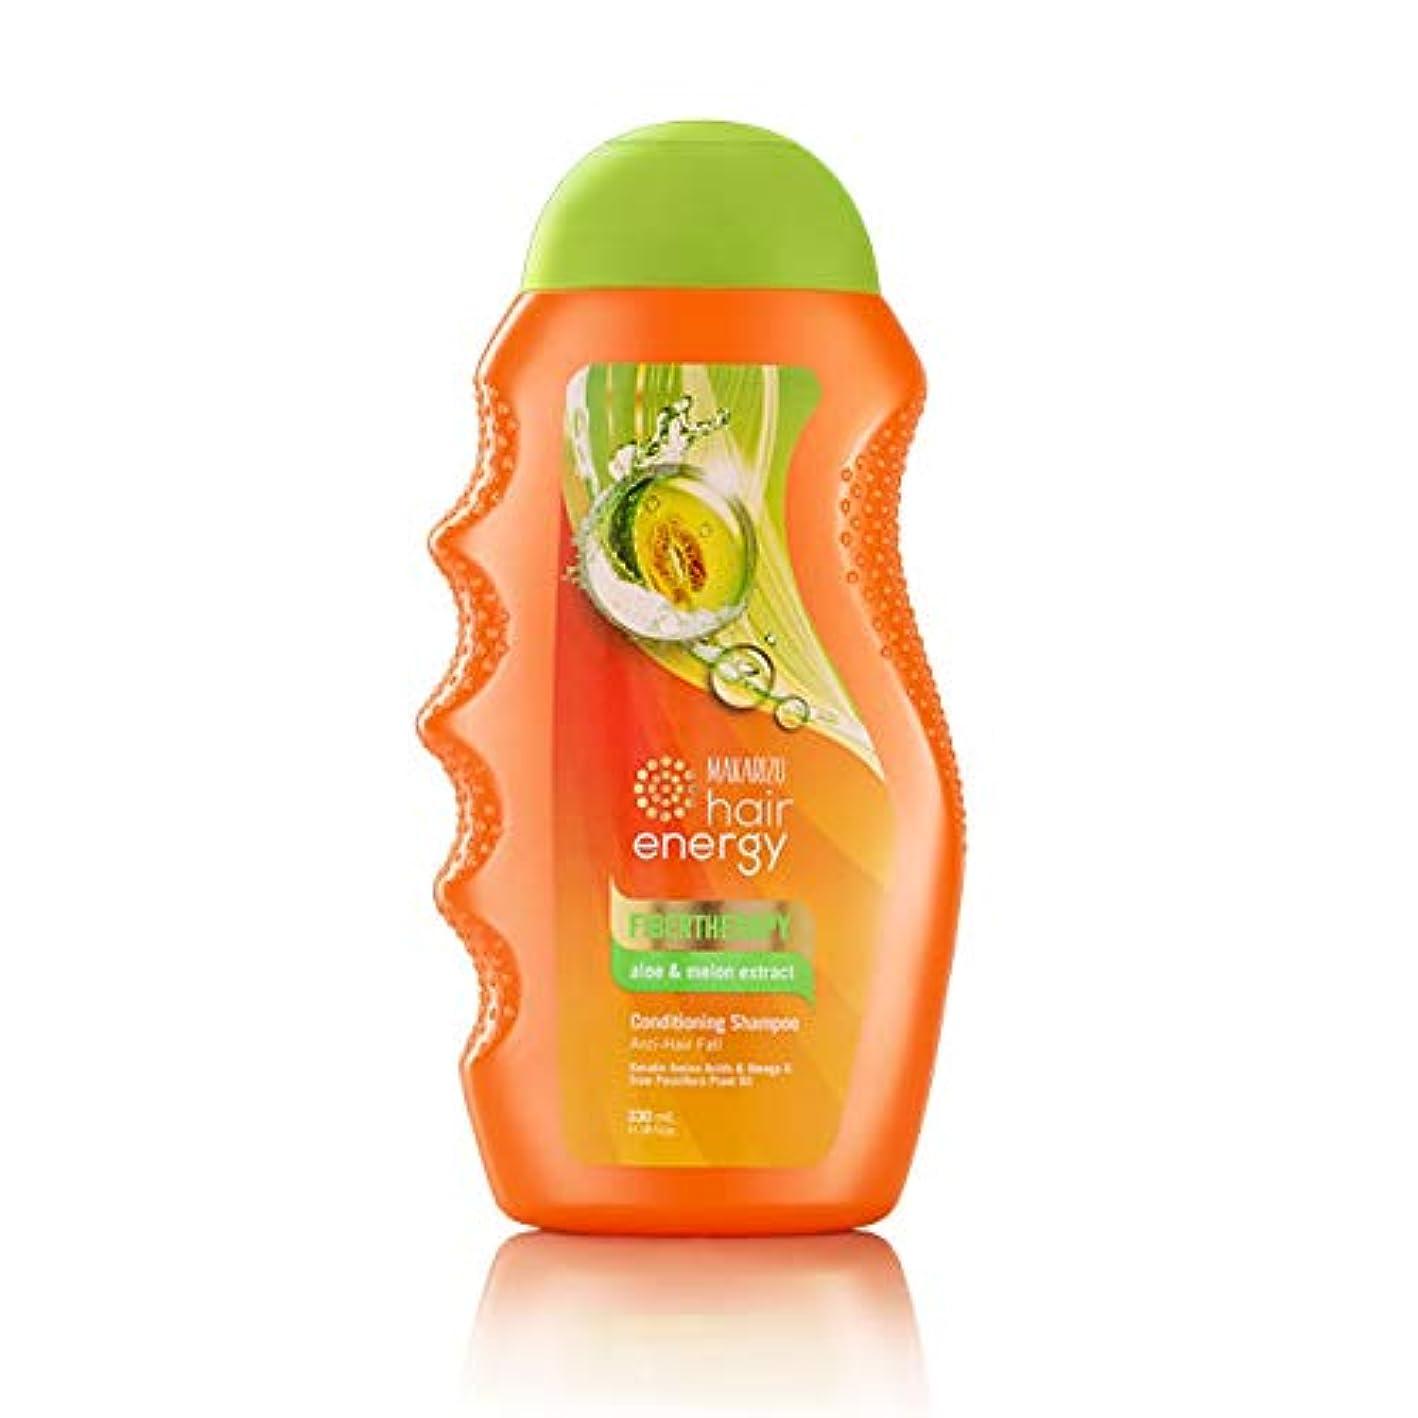 MAKARIZO マカリゾ Hair Energy ヘアエナジー ファイバーセラピー コンディショニングシャンプー 170ml Aloe&Melon アロエ&メロン [海外直送品]